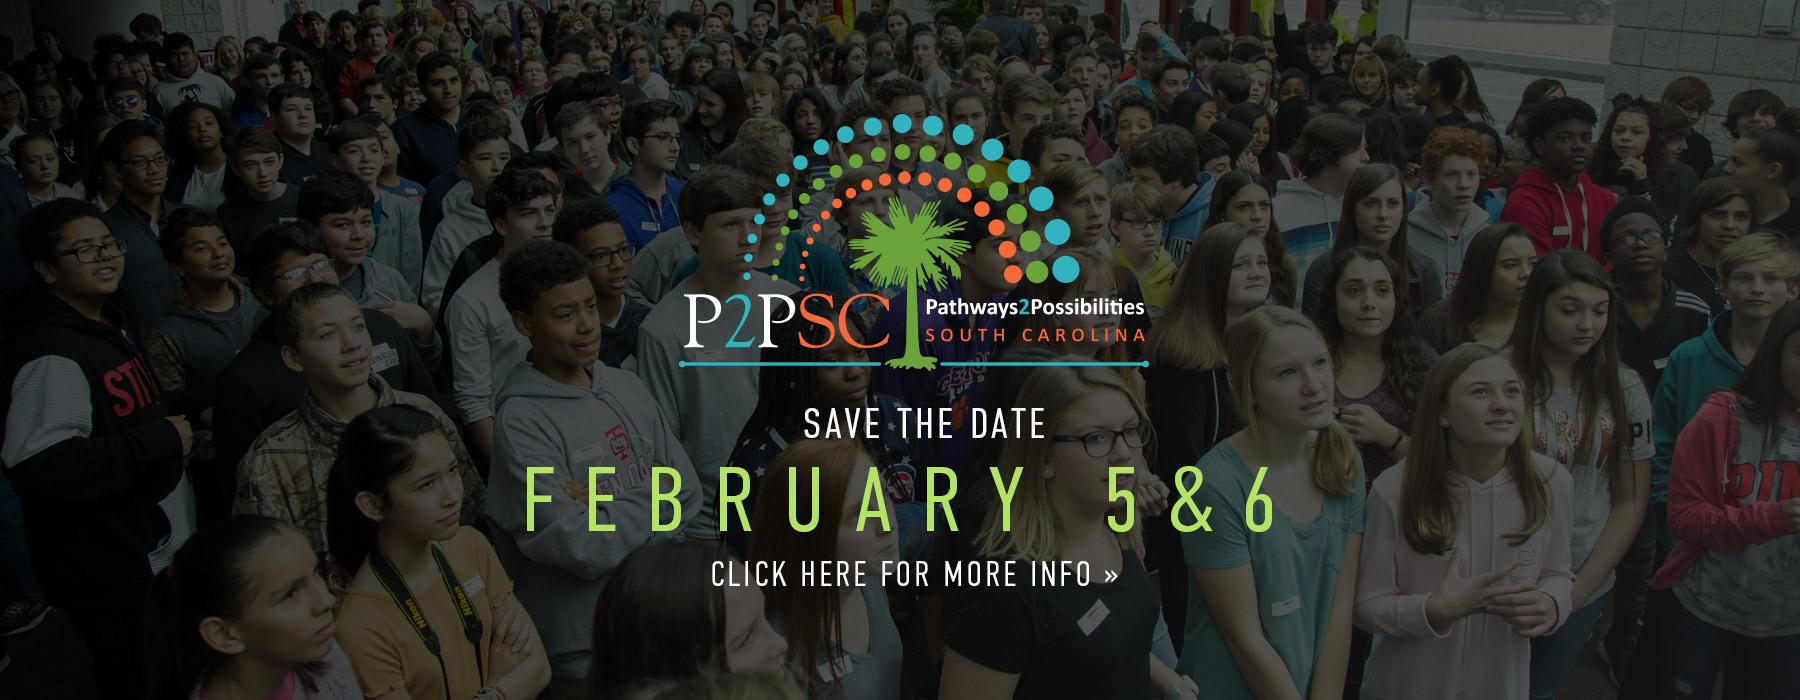 P2P SC 2020